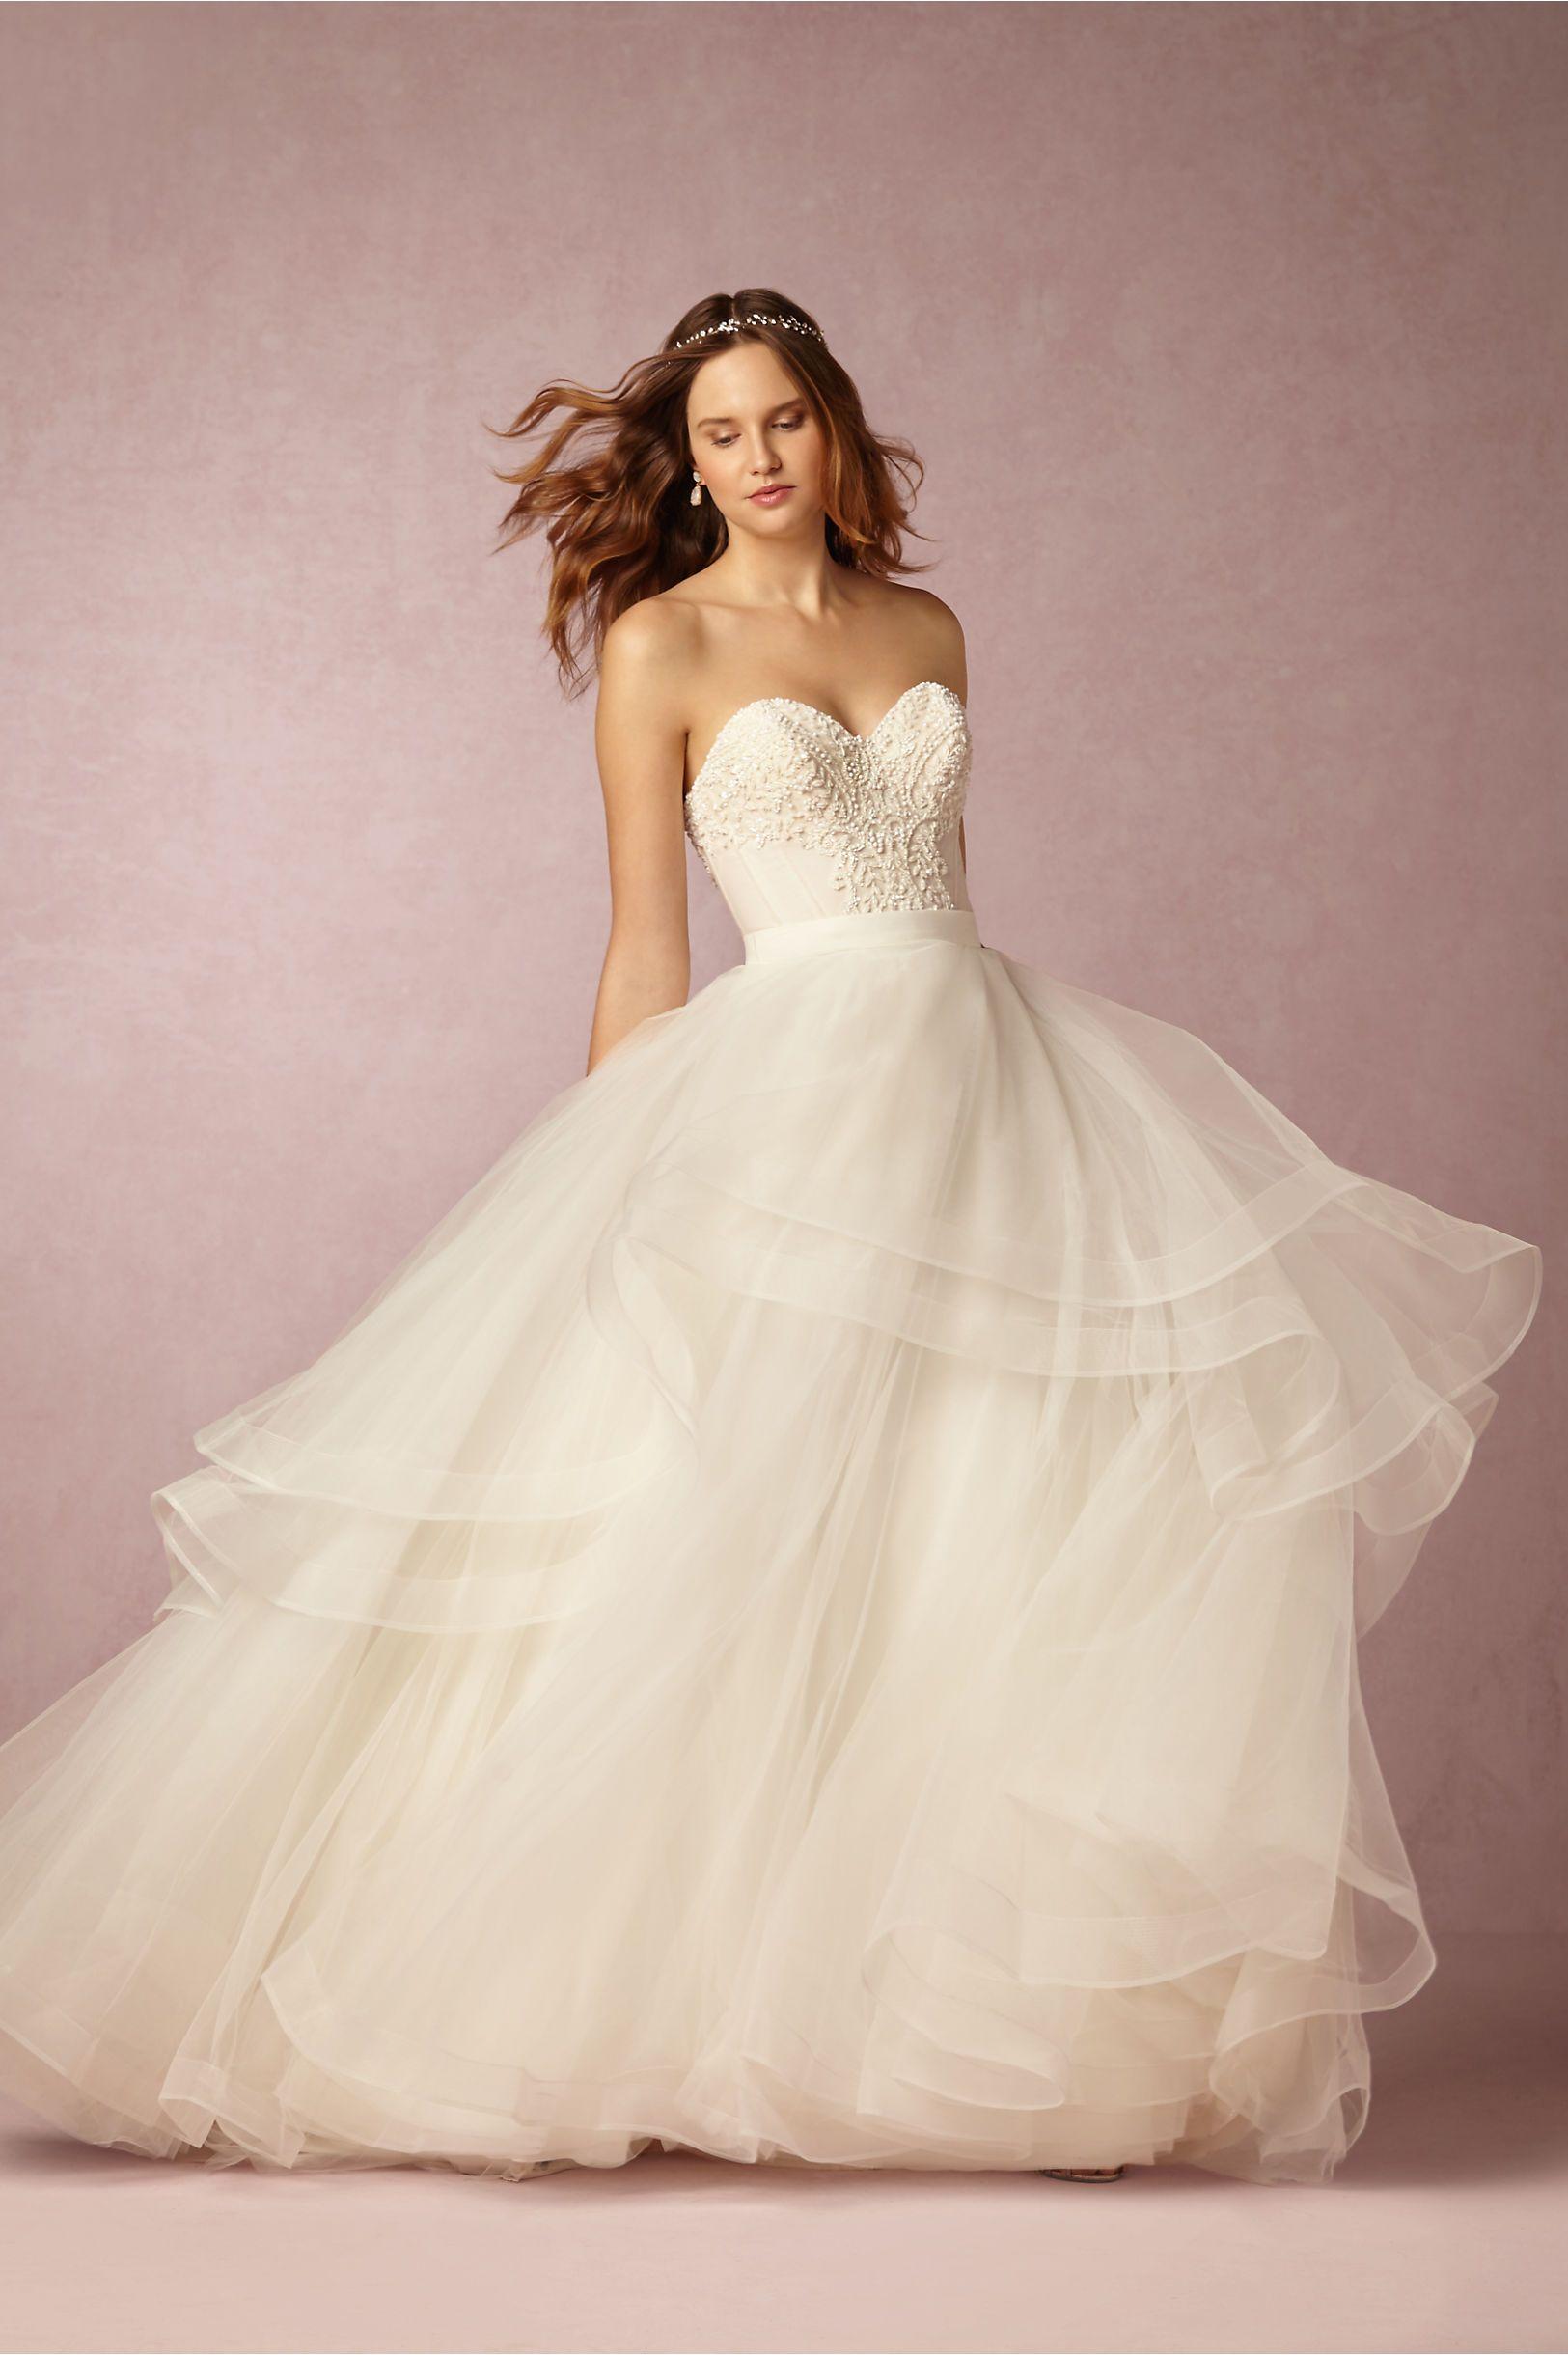 Simple BHLDN Tisha Corset u Almira Skirt in Bride Wedding Dresses at BHLDN Follow my posts